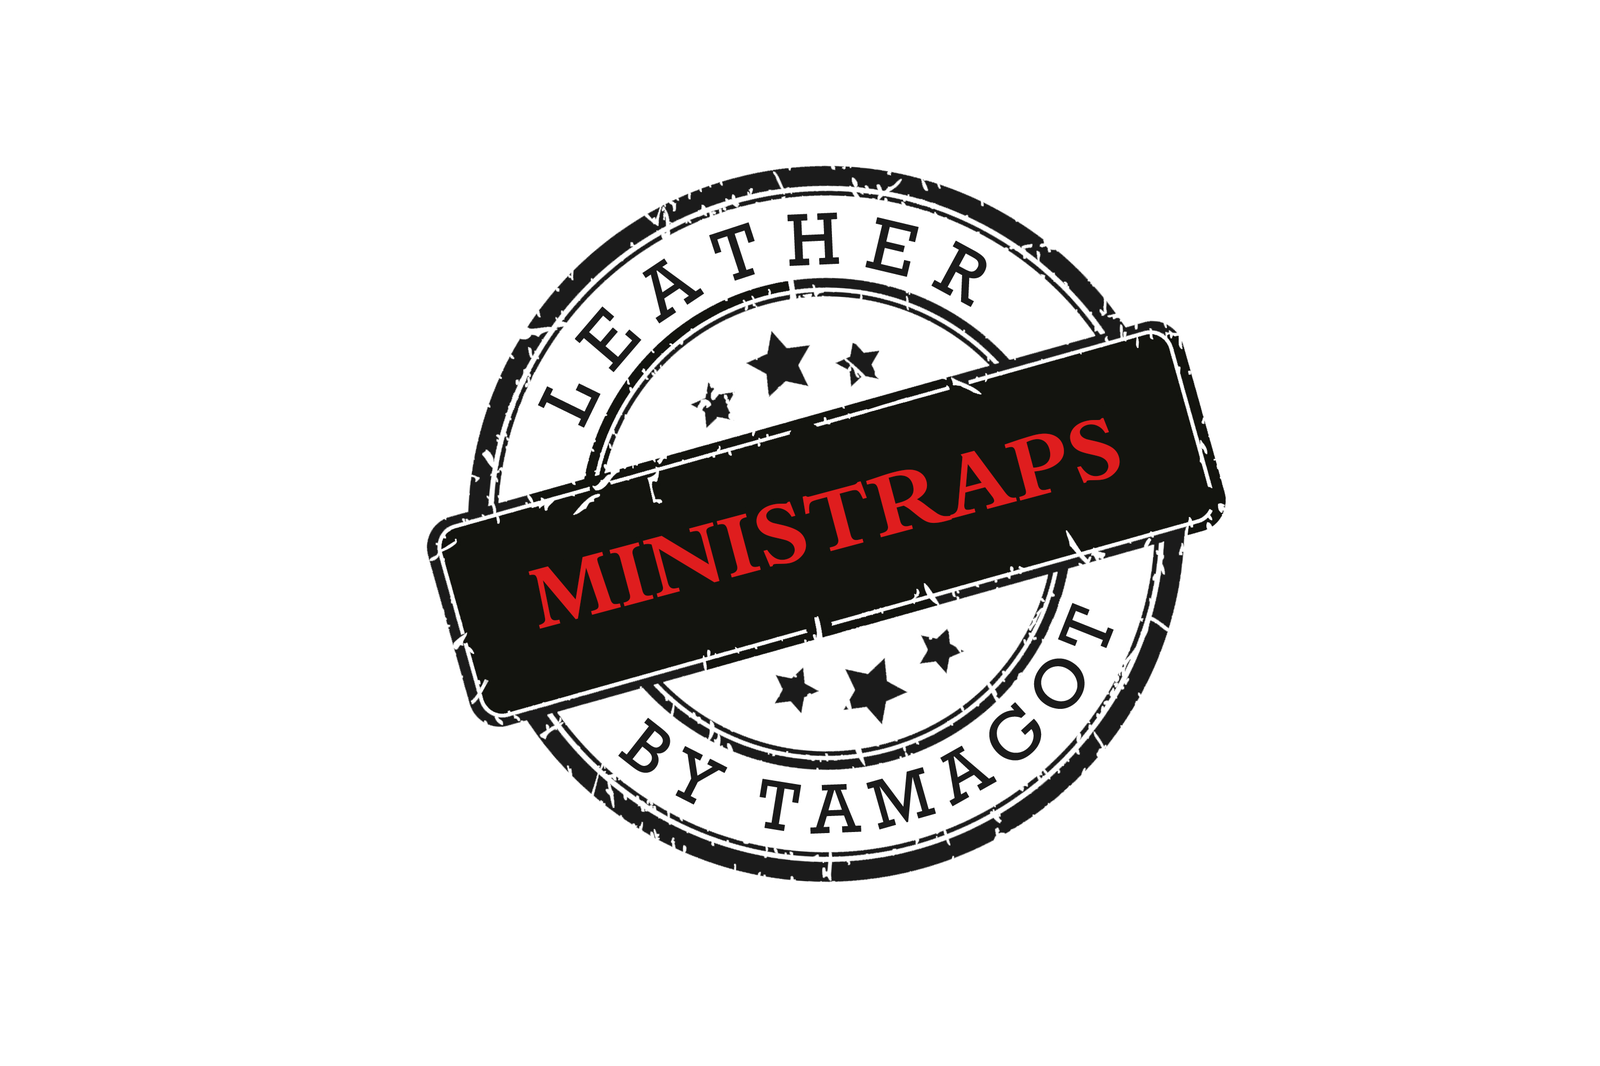 ministraps